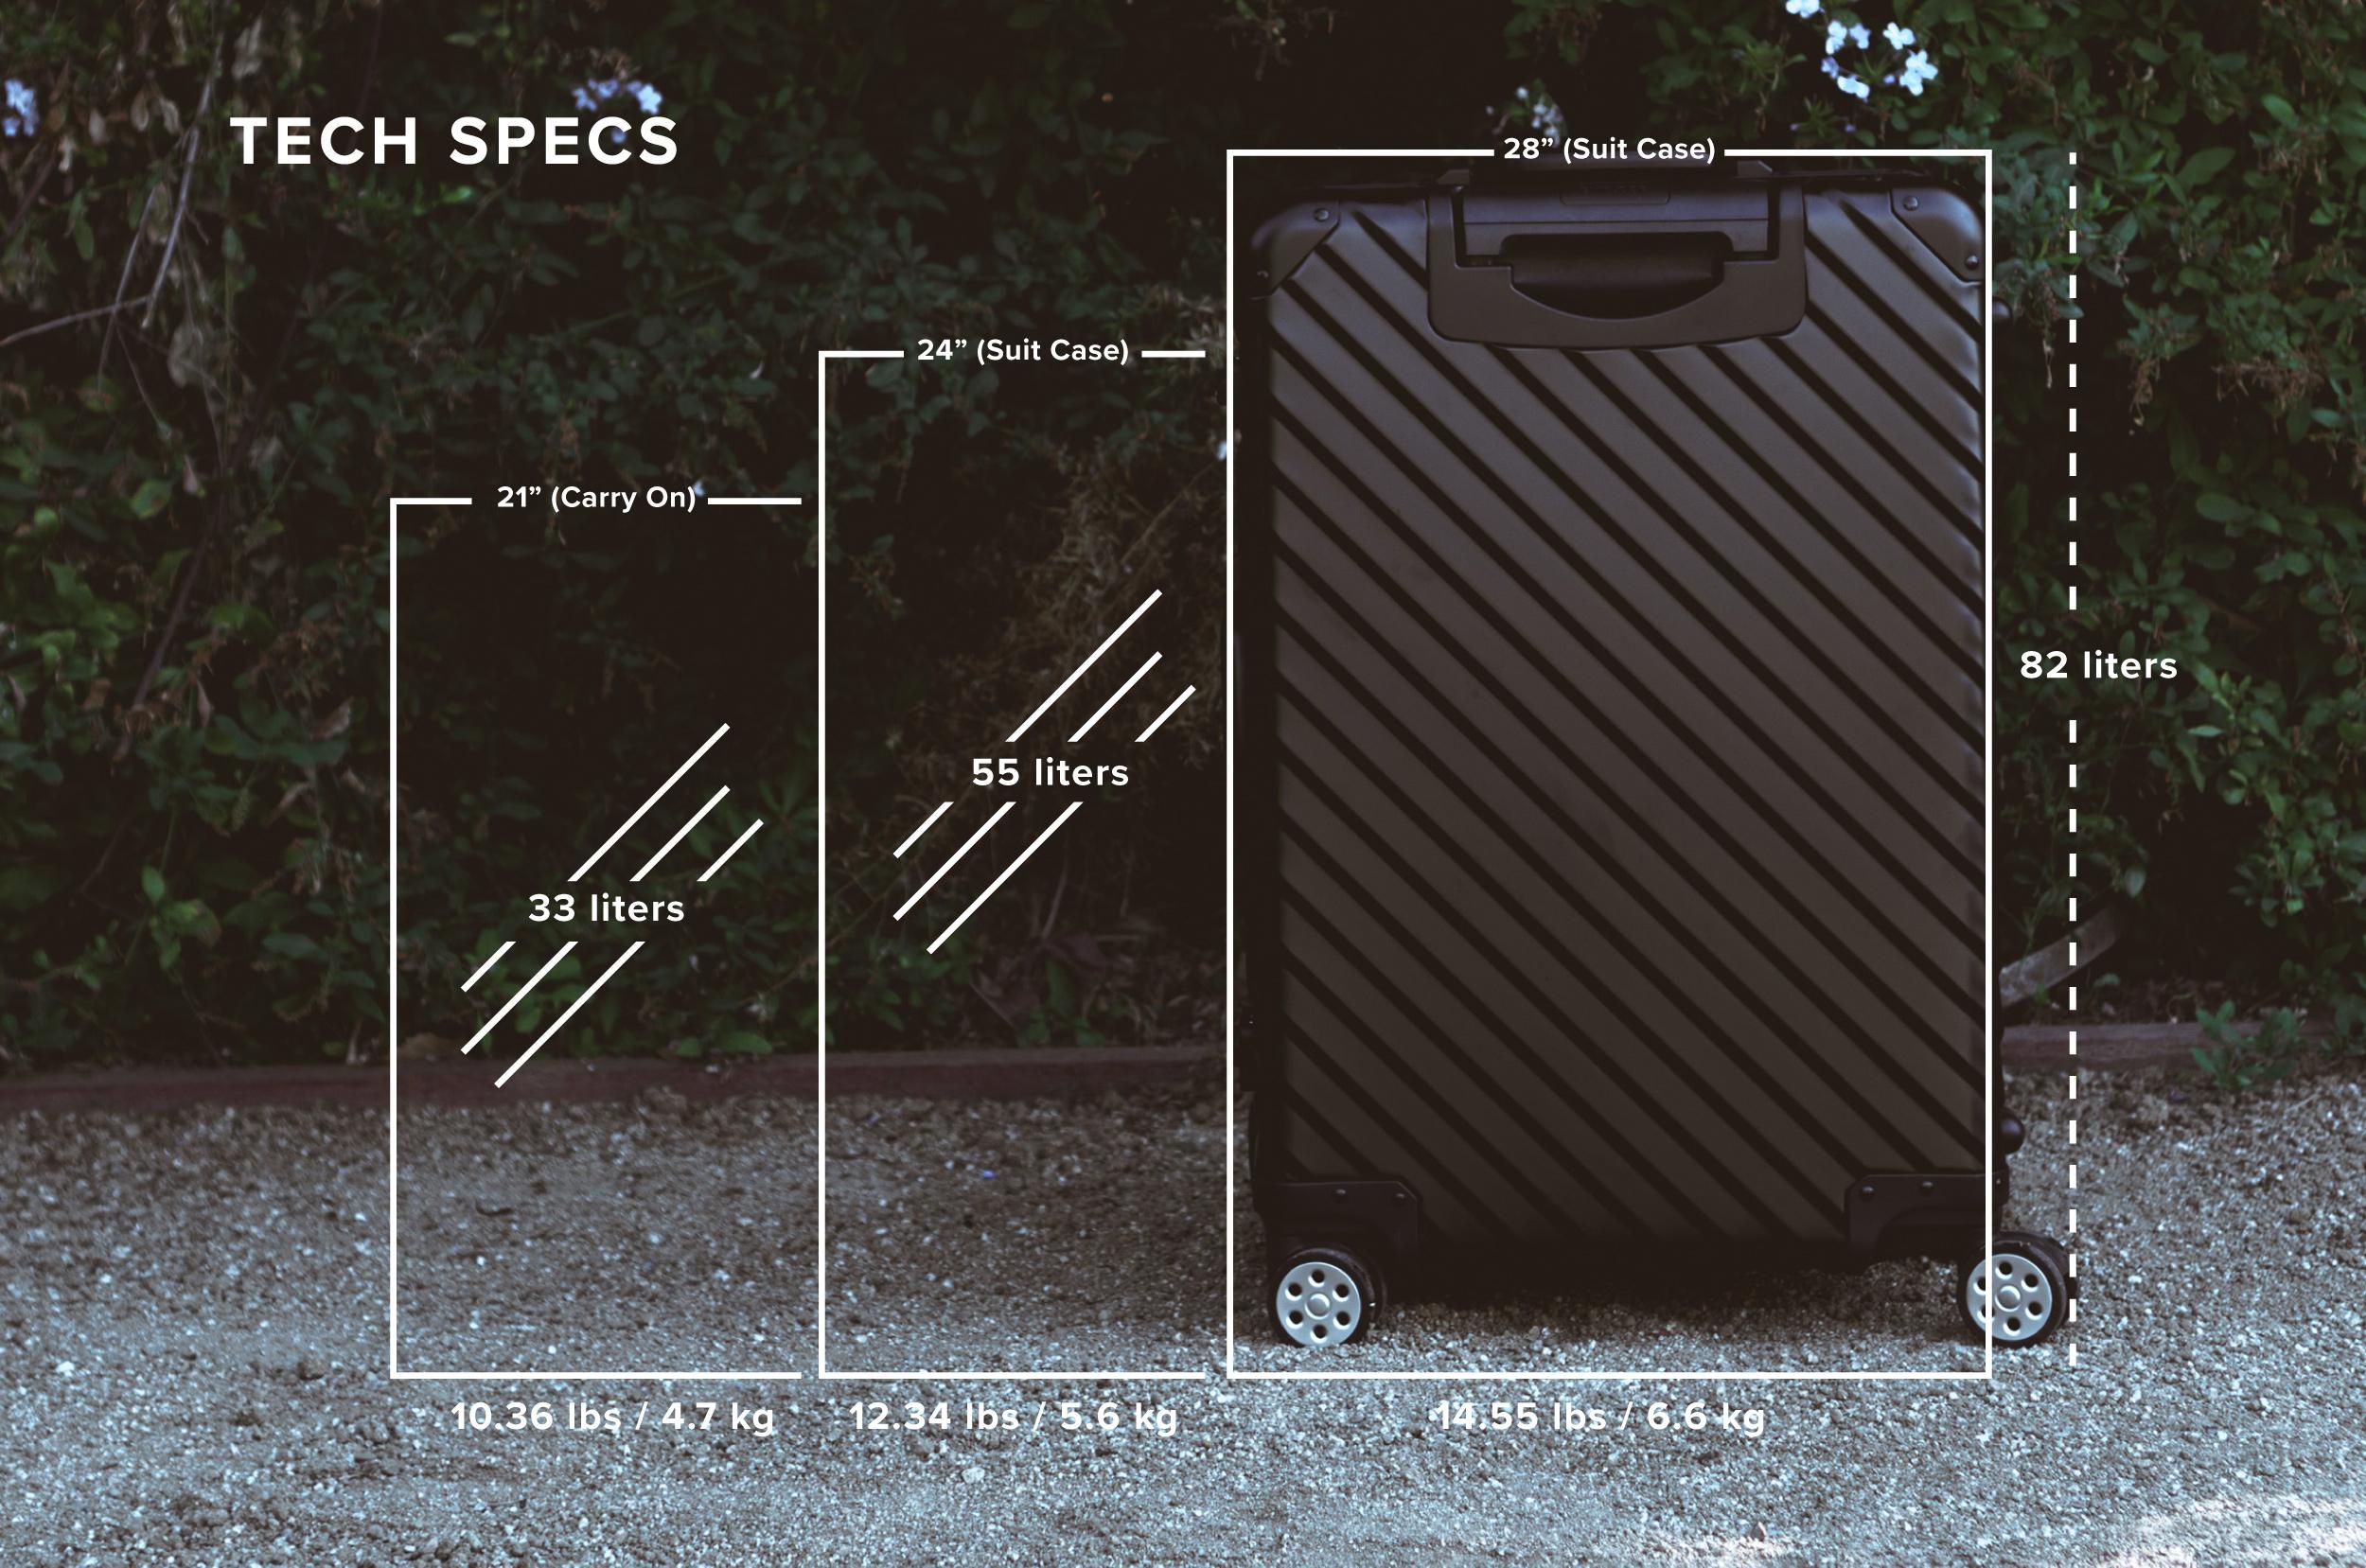 klasik-tech-specs(black).jpg